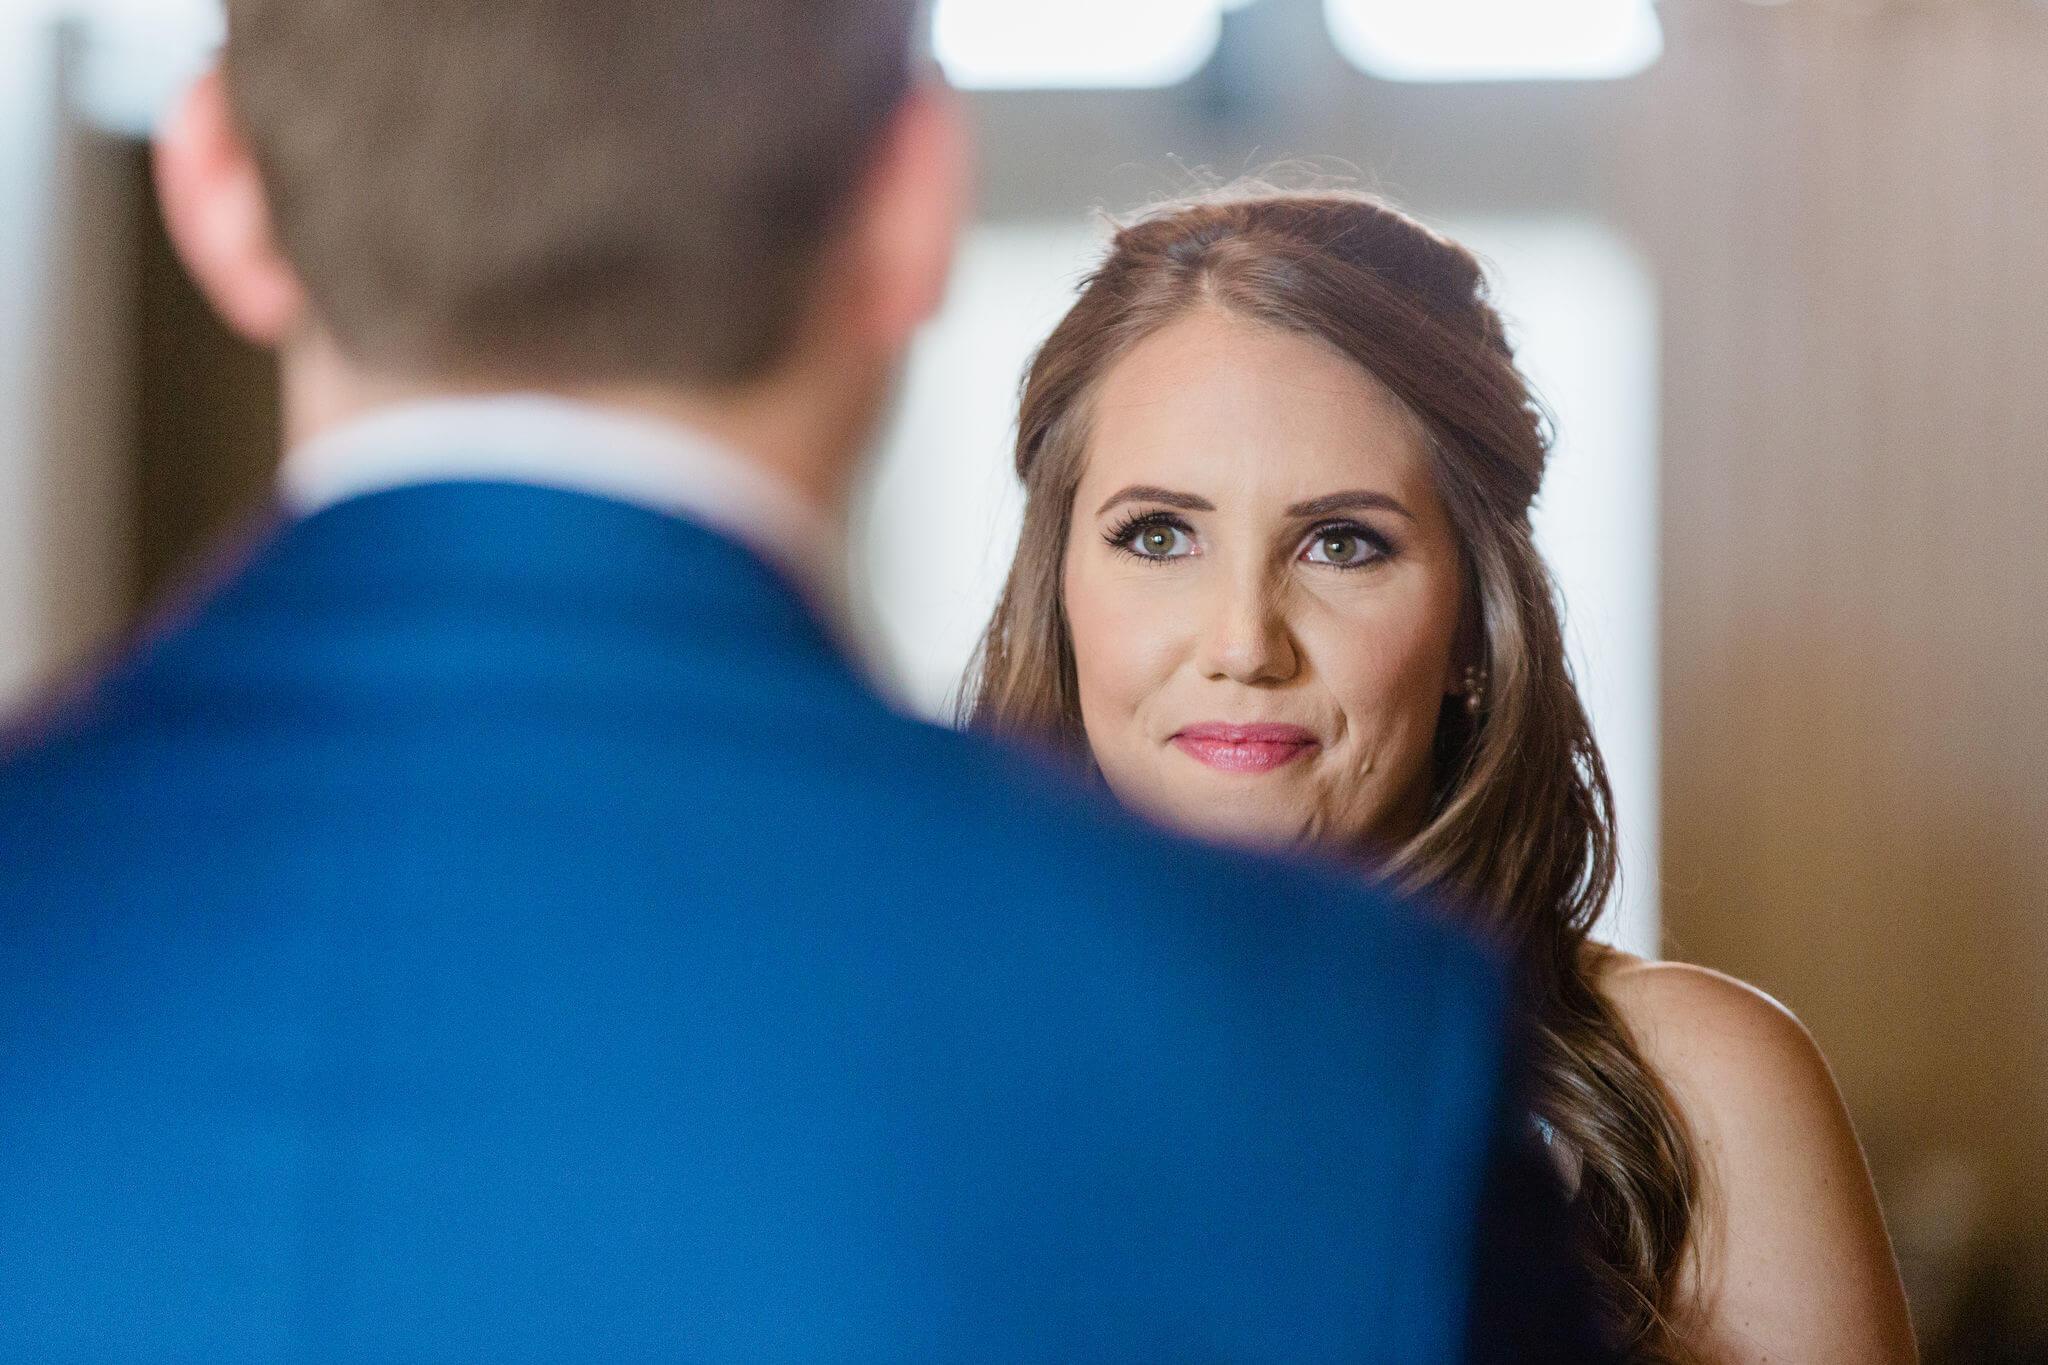 apt-b-photography-savannah-wedding-photographer-savannah-wedding-savannah-elopement-intimate-wedding-photographer-61.JPG